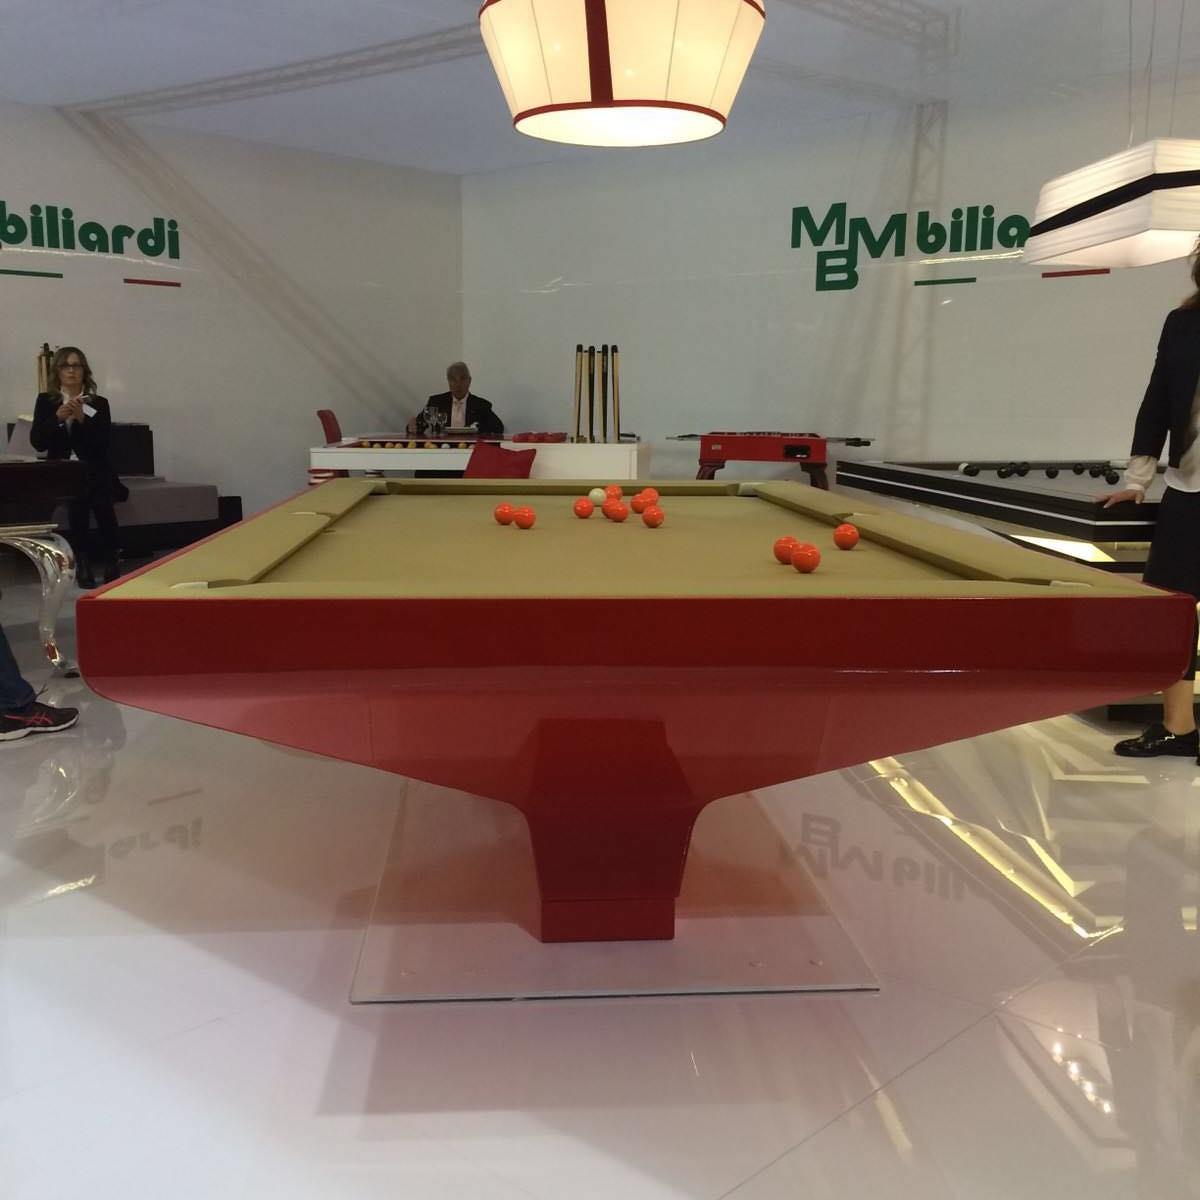 Salone_Internazionalei_Milano_2016_isaloni_MBM_Biliardi5